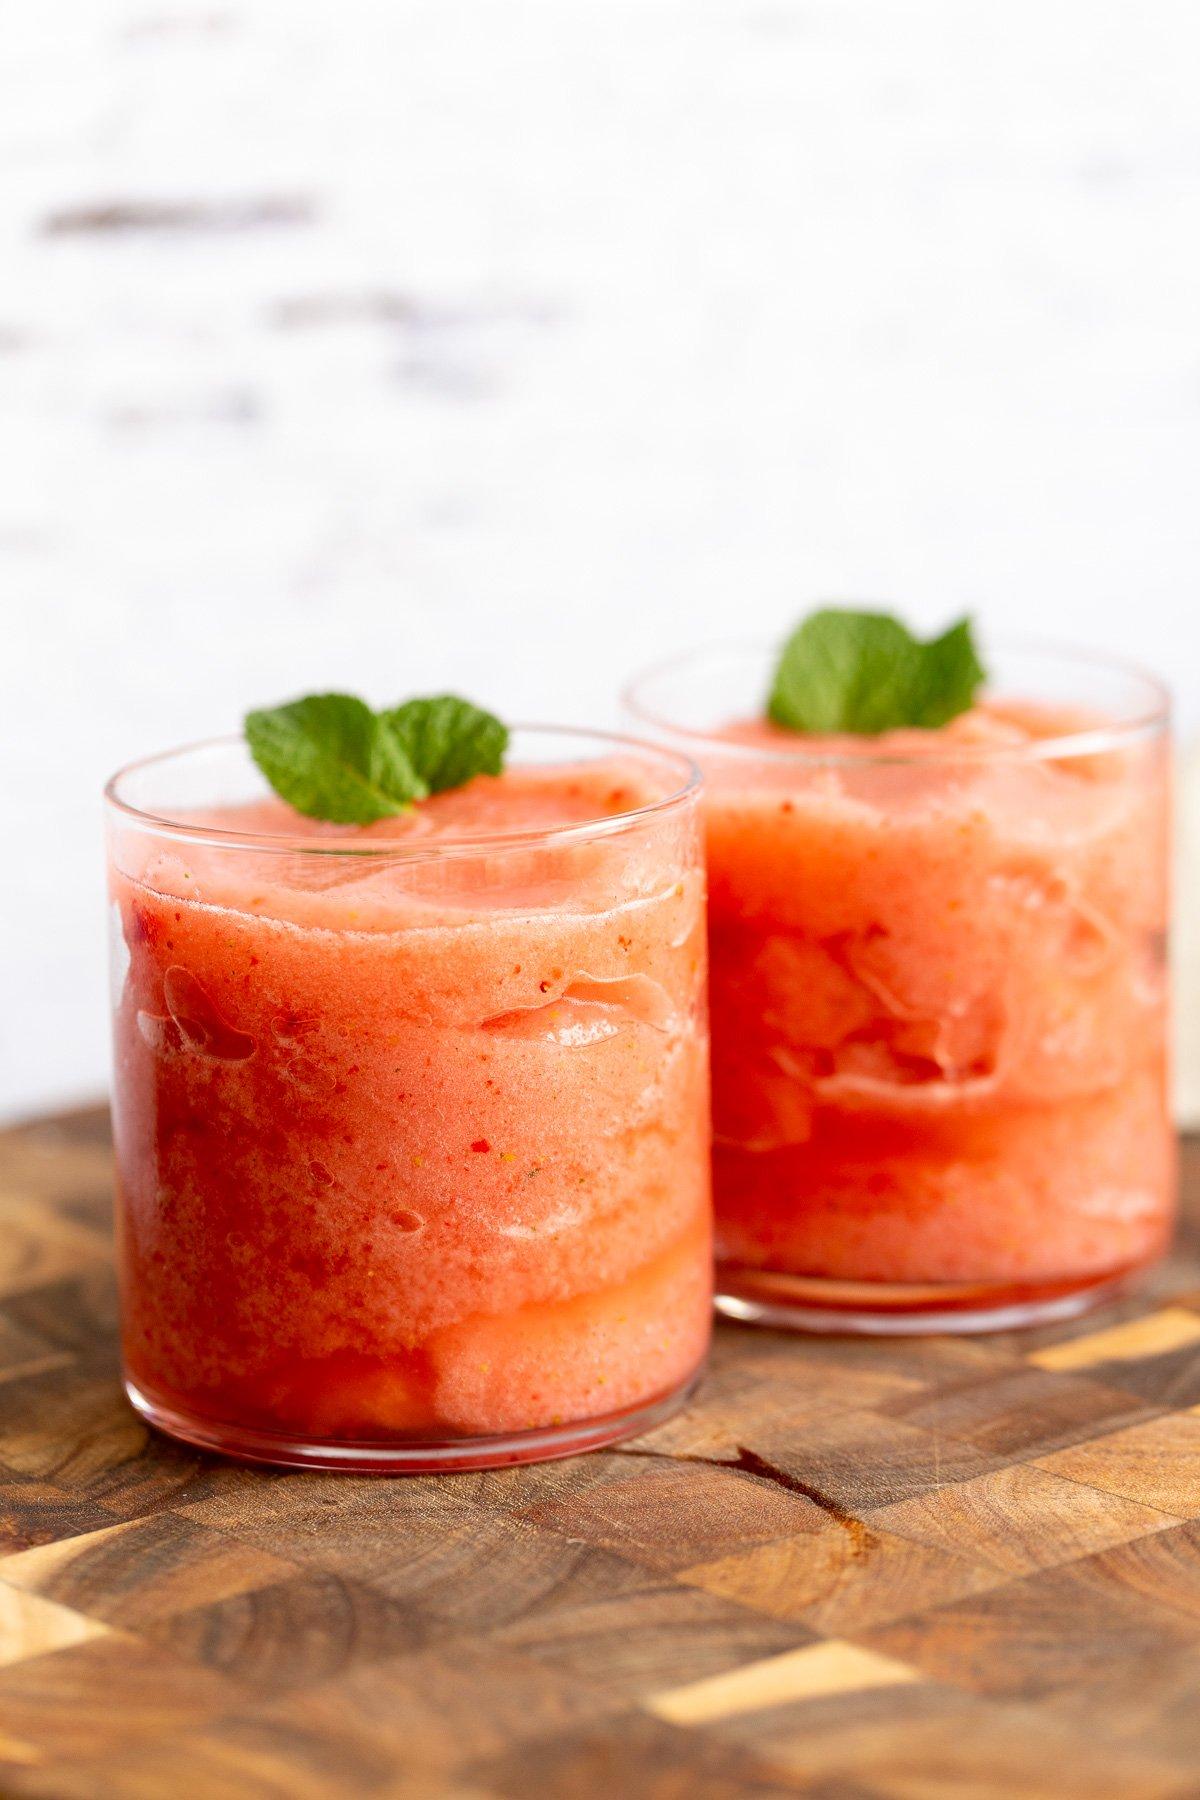 two glasses with homemade vegan strawberry lemonade slushies